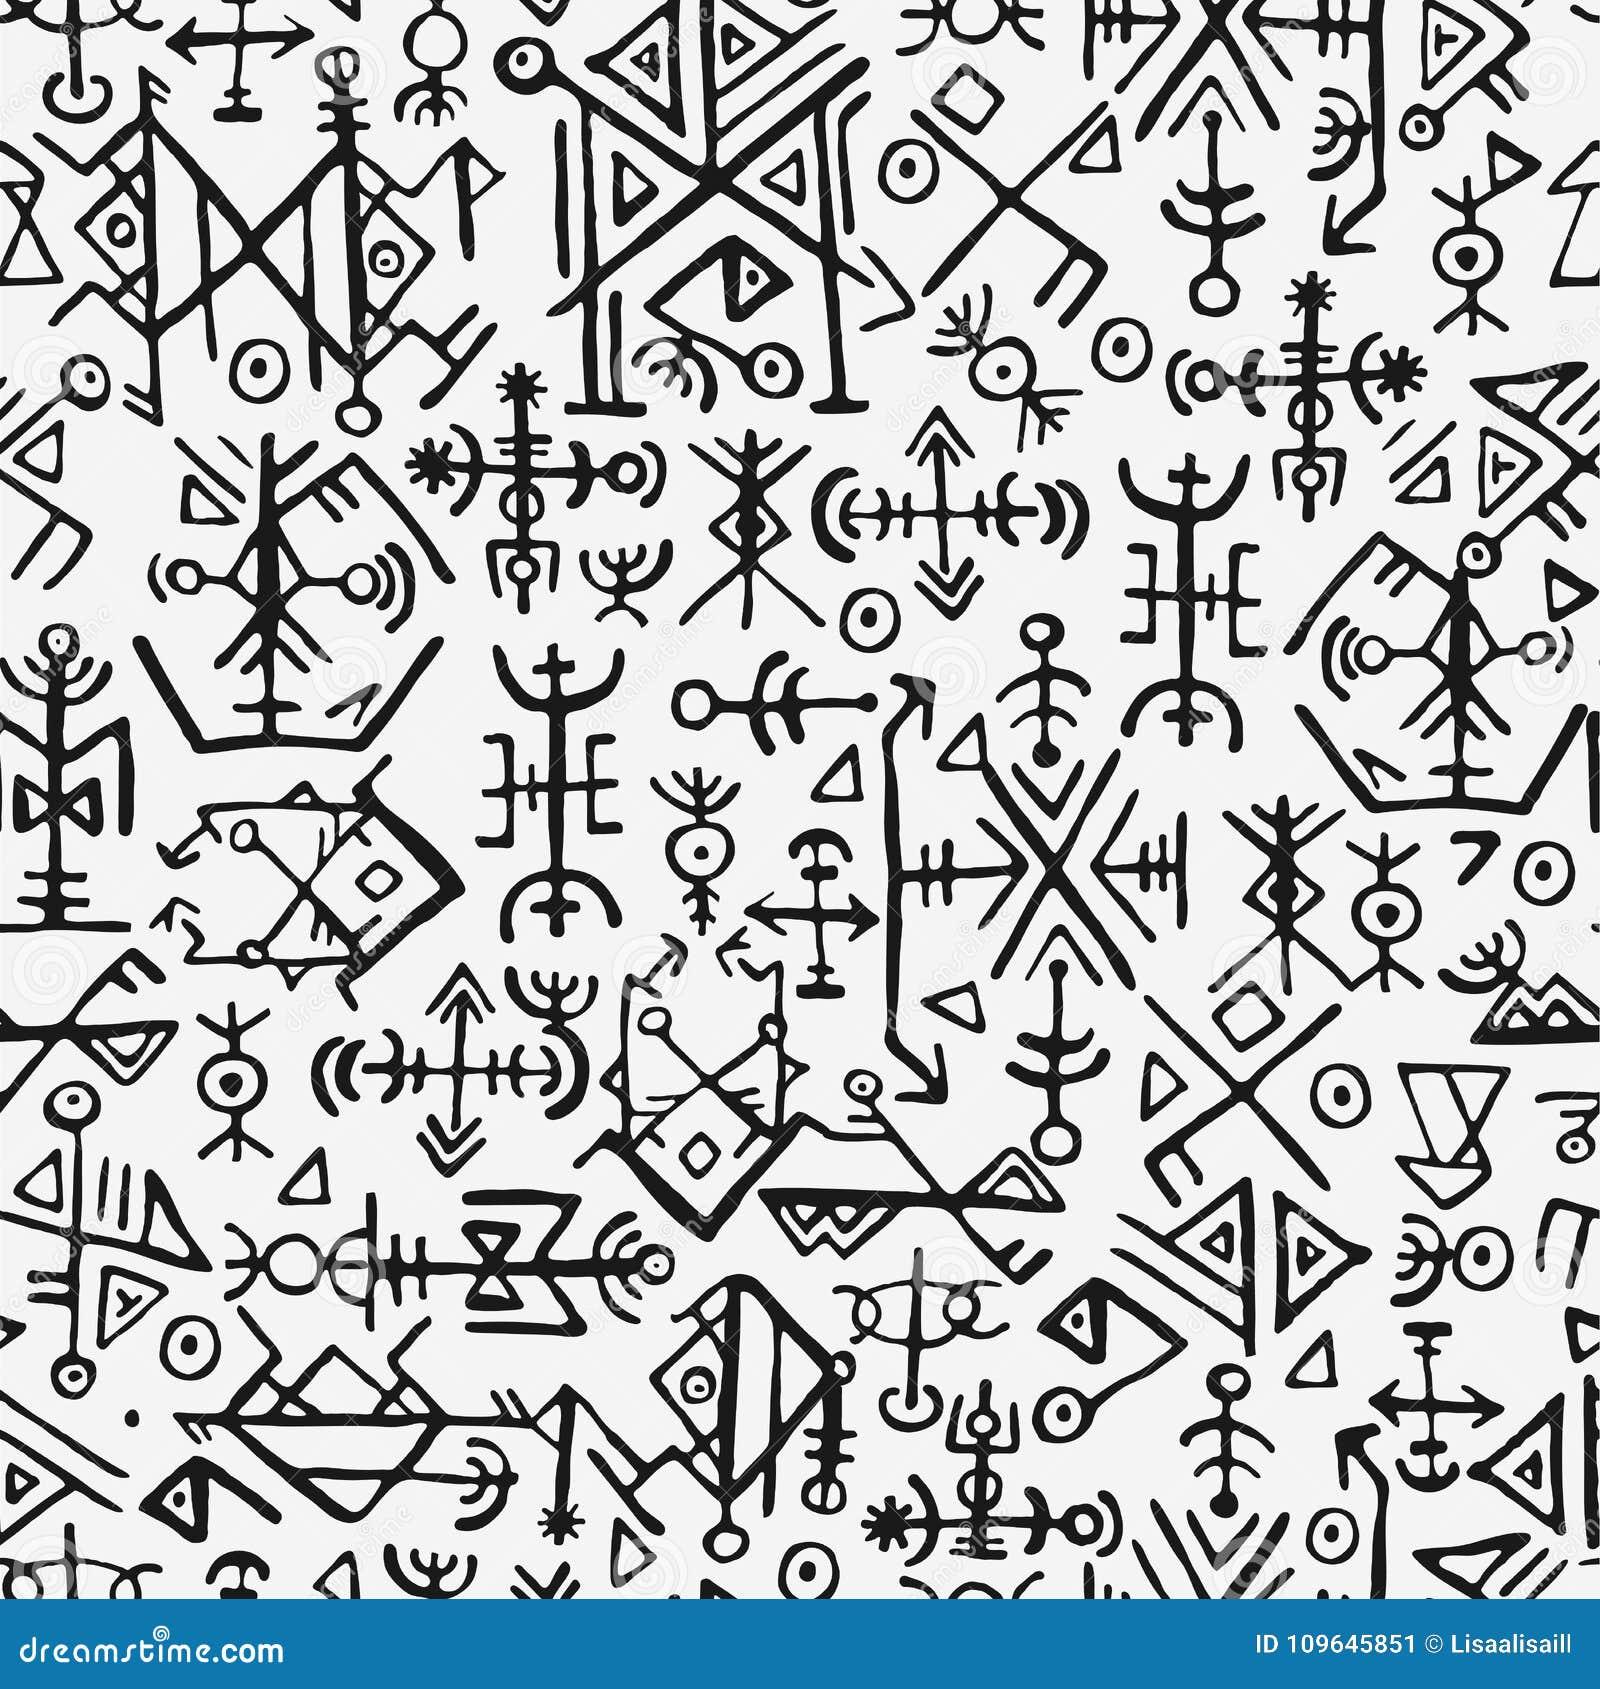 Futhark norse islandic and viking symbol seamless pattern magic futhark norse islandic and viking symbol seamless pattern magic hand draw symbols as scripted talismans repeatable biocorpaavc Choice Image